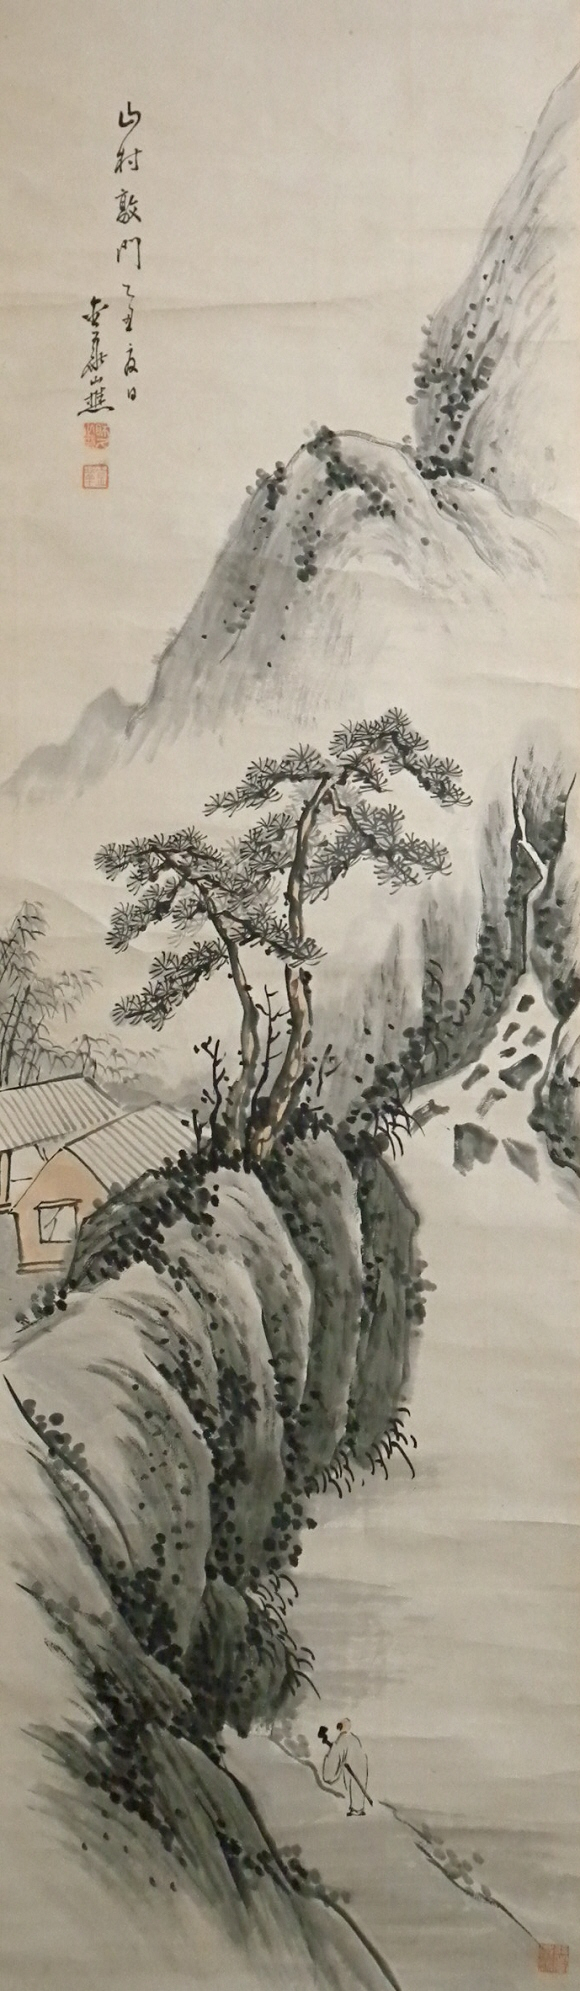 580x1991 Japanese Landscape Drawing Sp 10068 [ Mountain Village ] Japanese